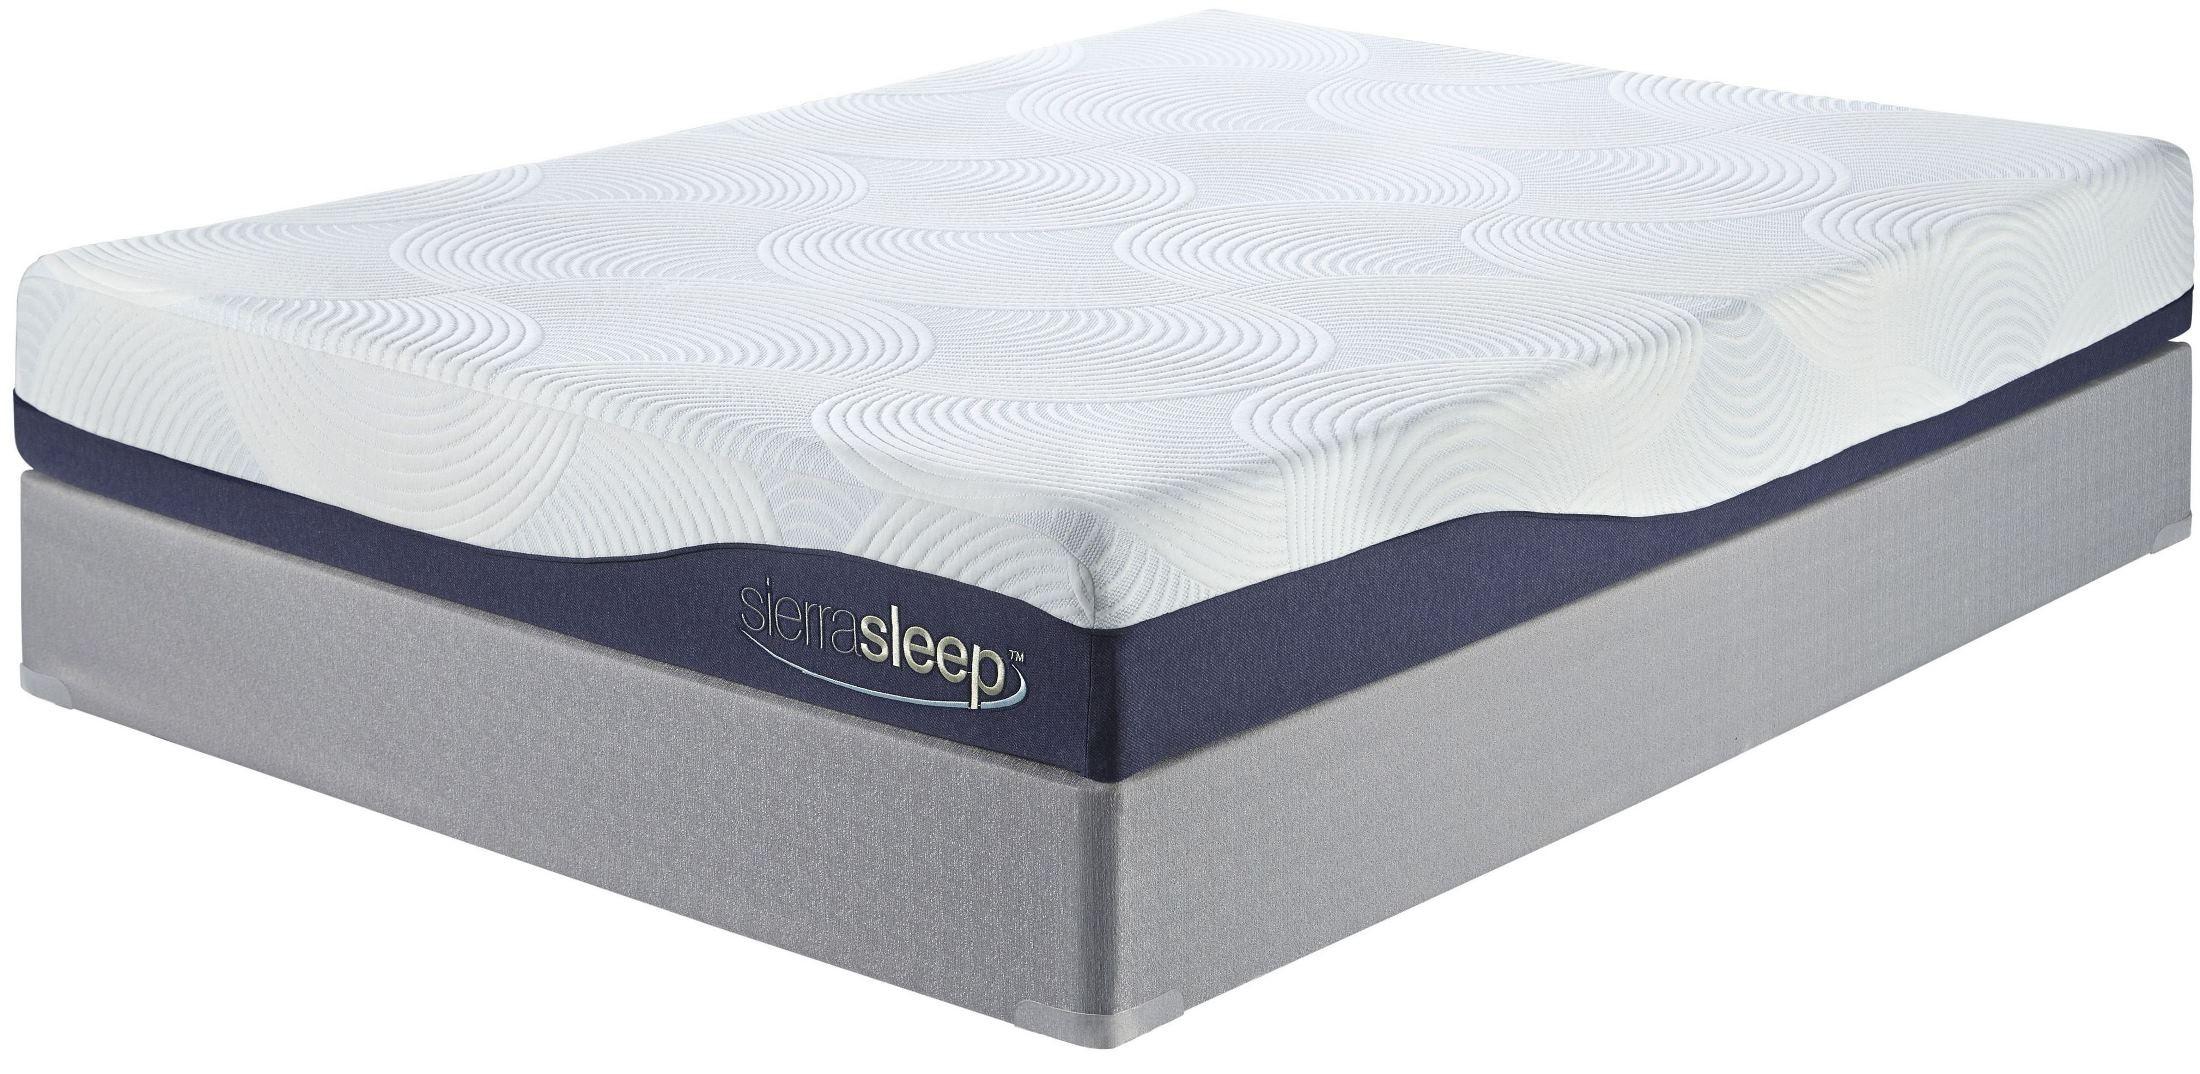 9 Inch Gel Memory Foam White King Mattress From Ashley M97241 Coleman Furniture